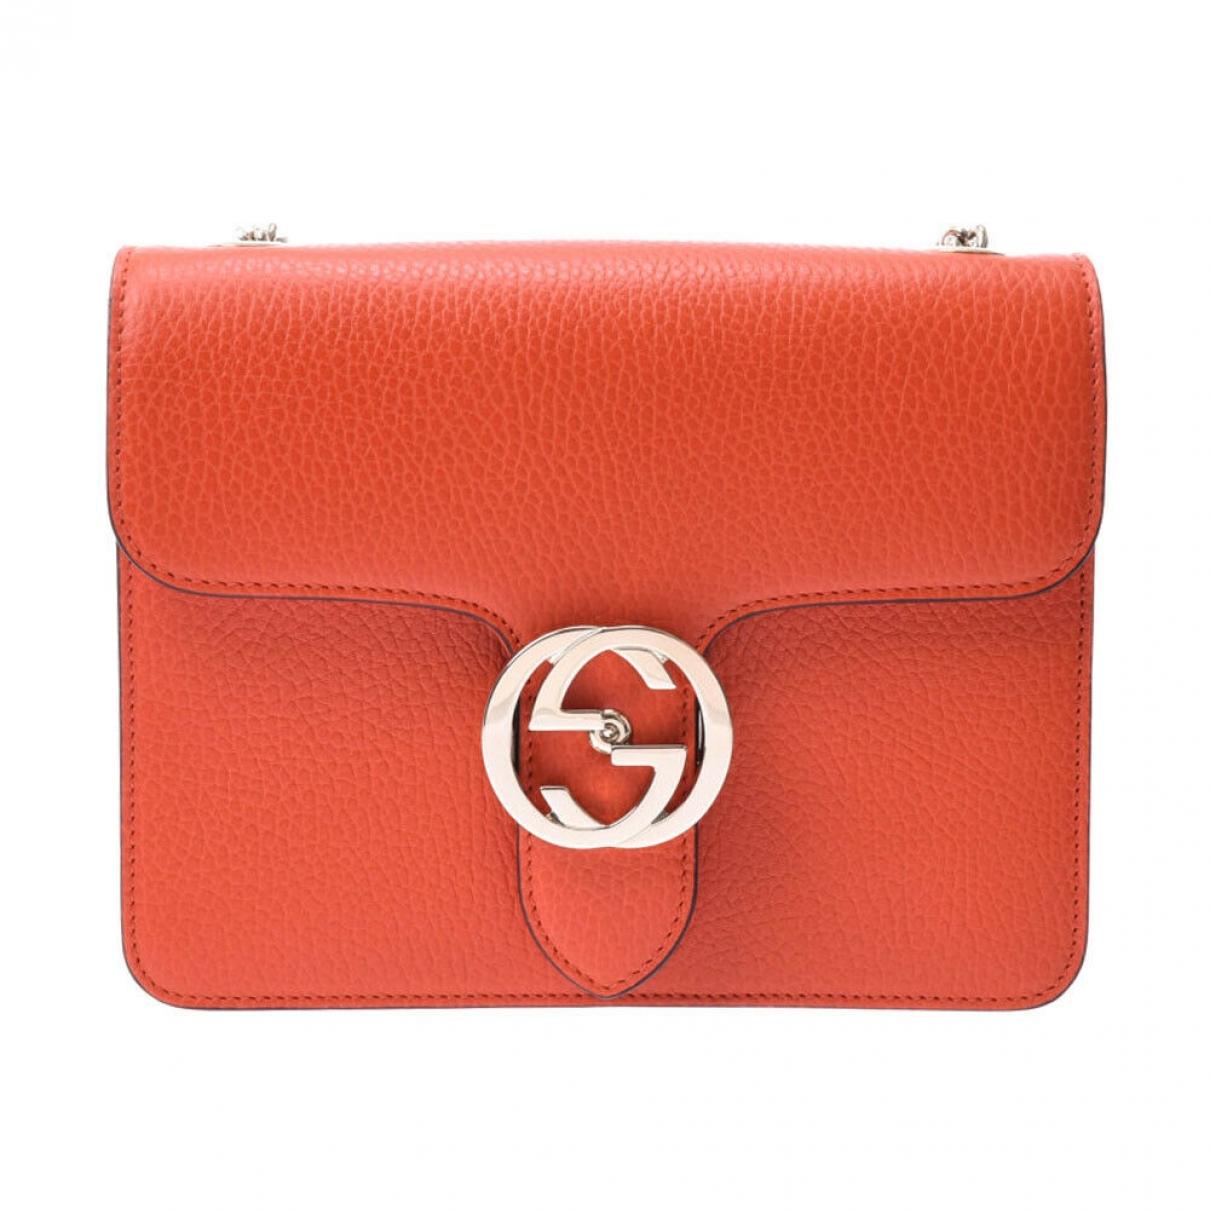 Gucci Interlocking Orange Leather handbag for Women \N